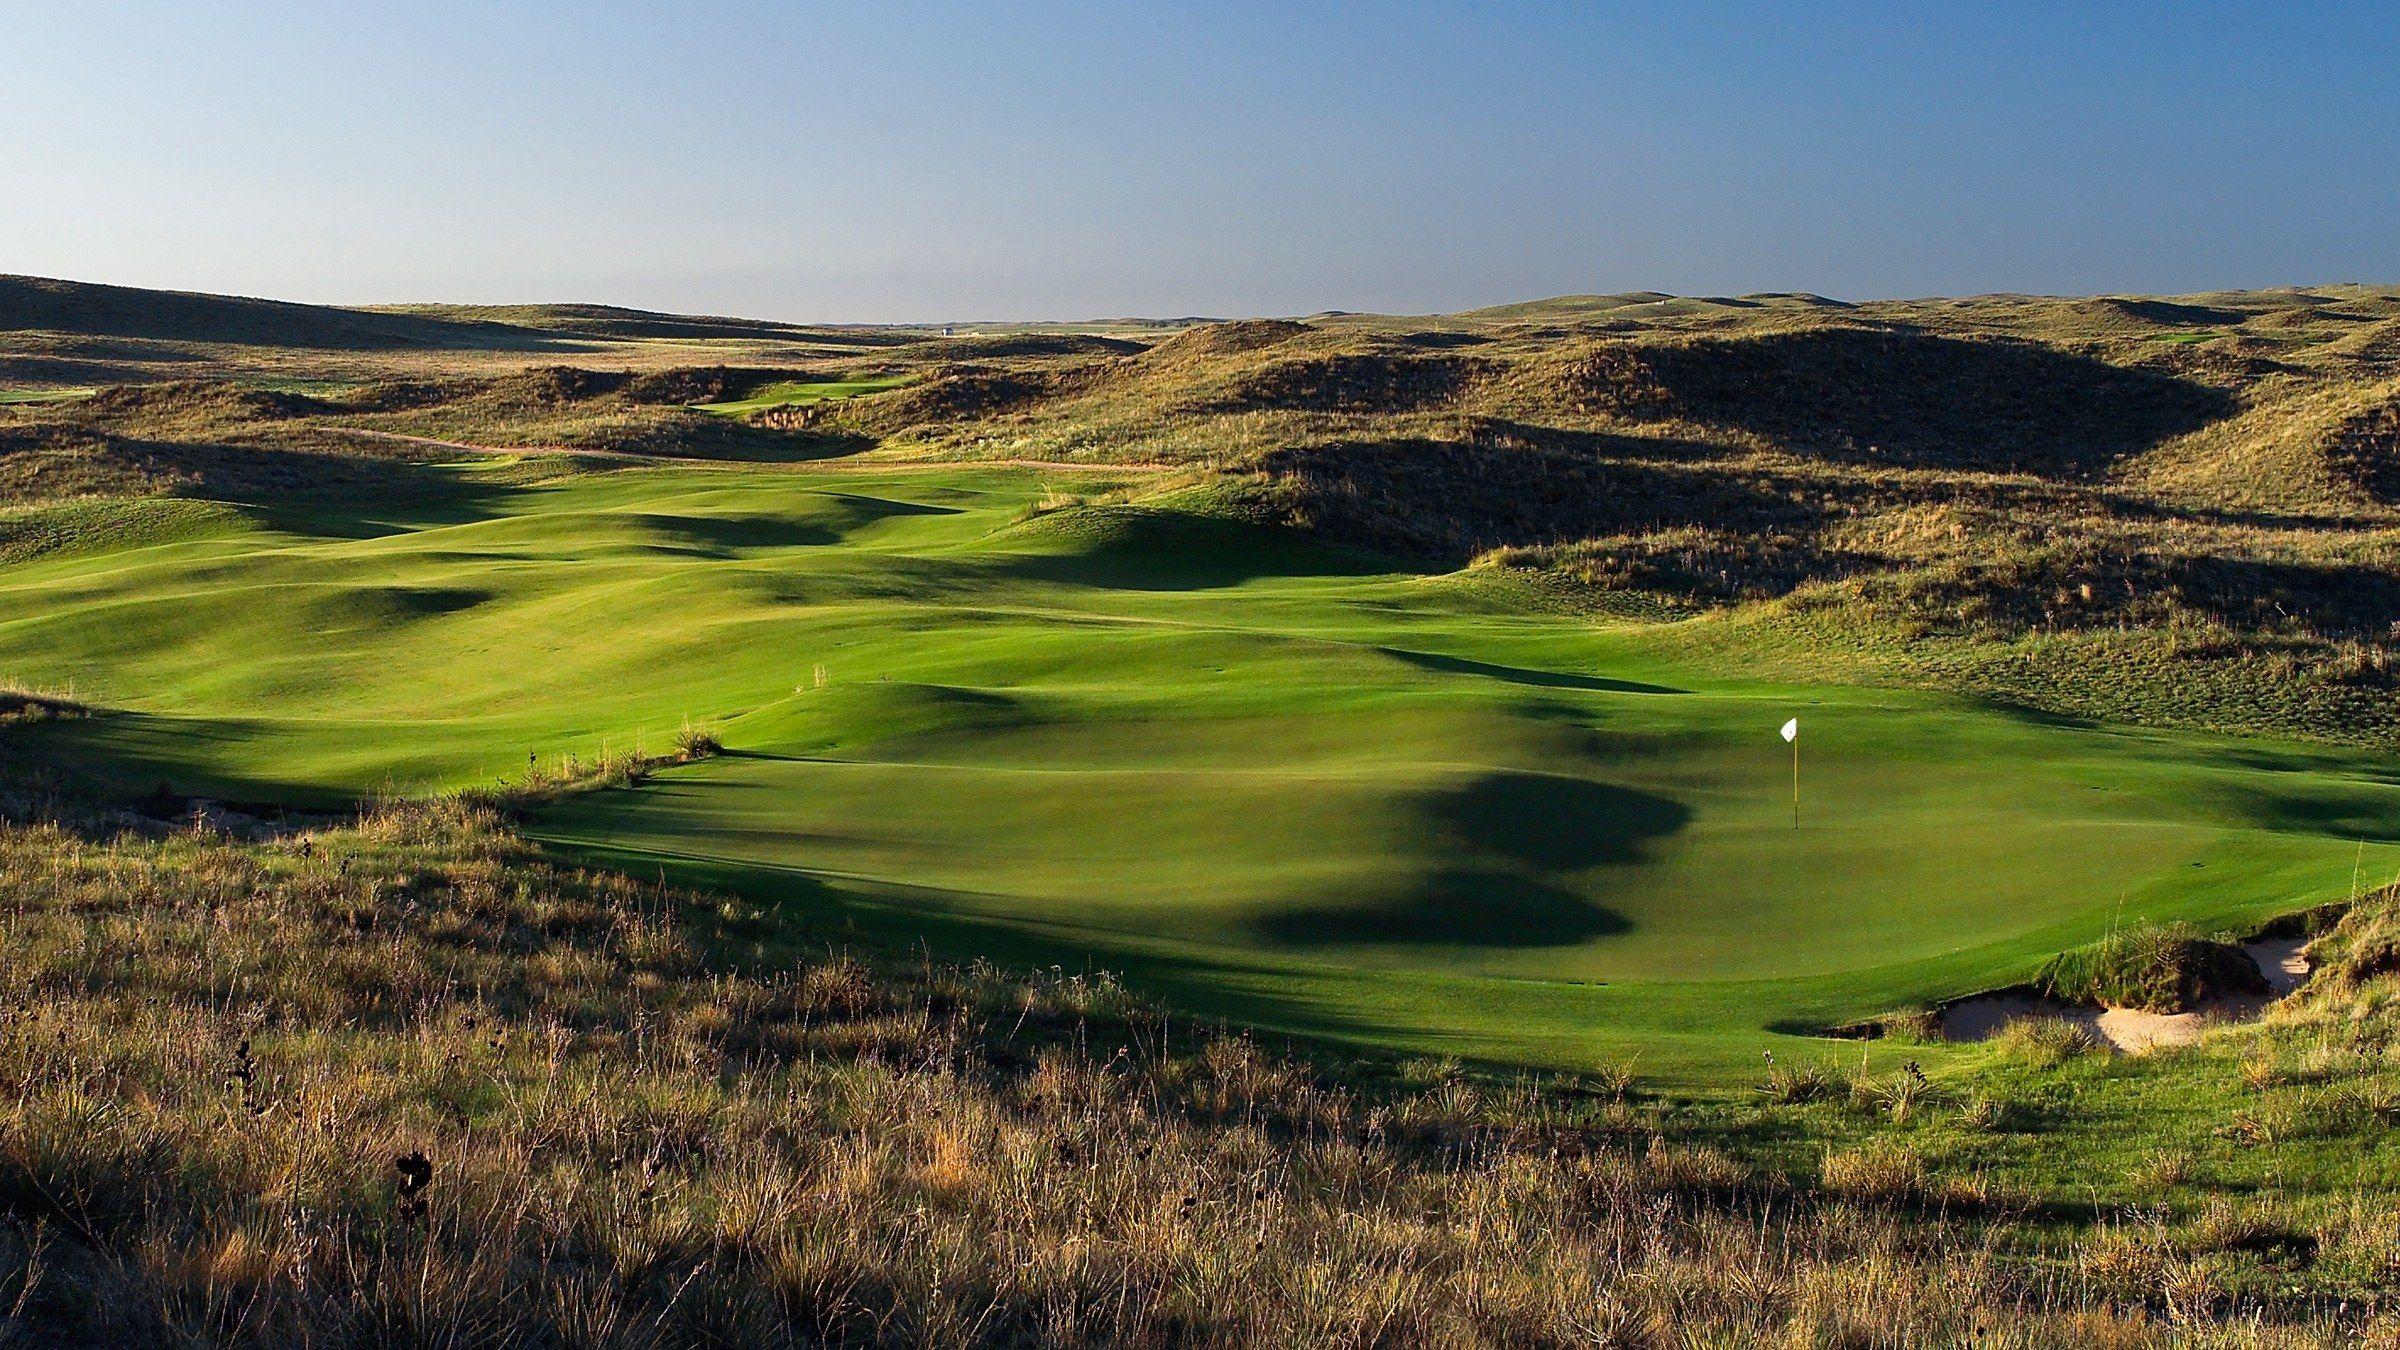 Top 100 US Golf Courses 2019-20 | Golf courses, Golf ...